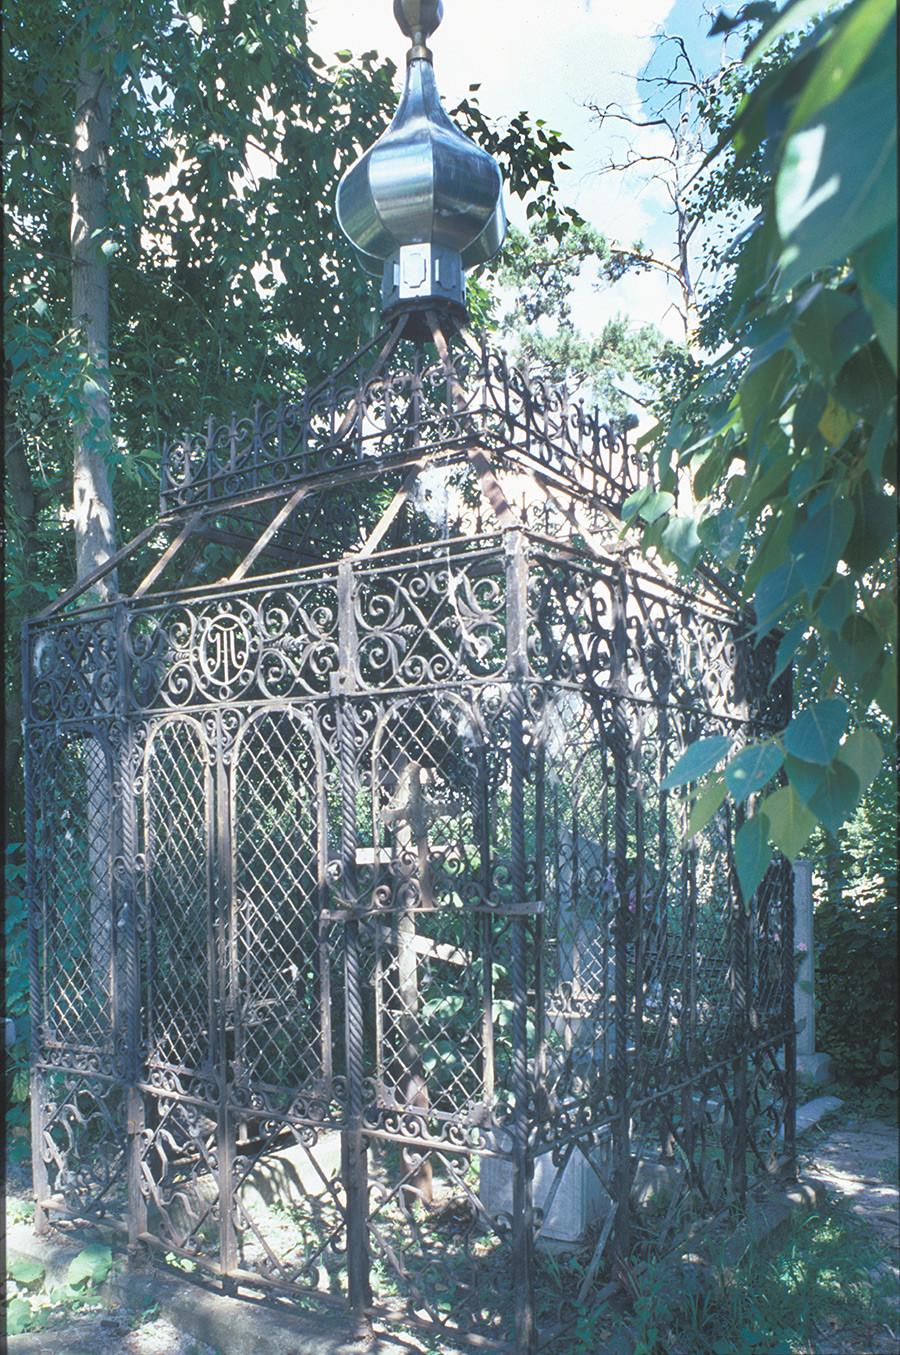 Kasli Cemetery. Burial plot enclosed with Kasli decorative iron work. July 14, 2003